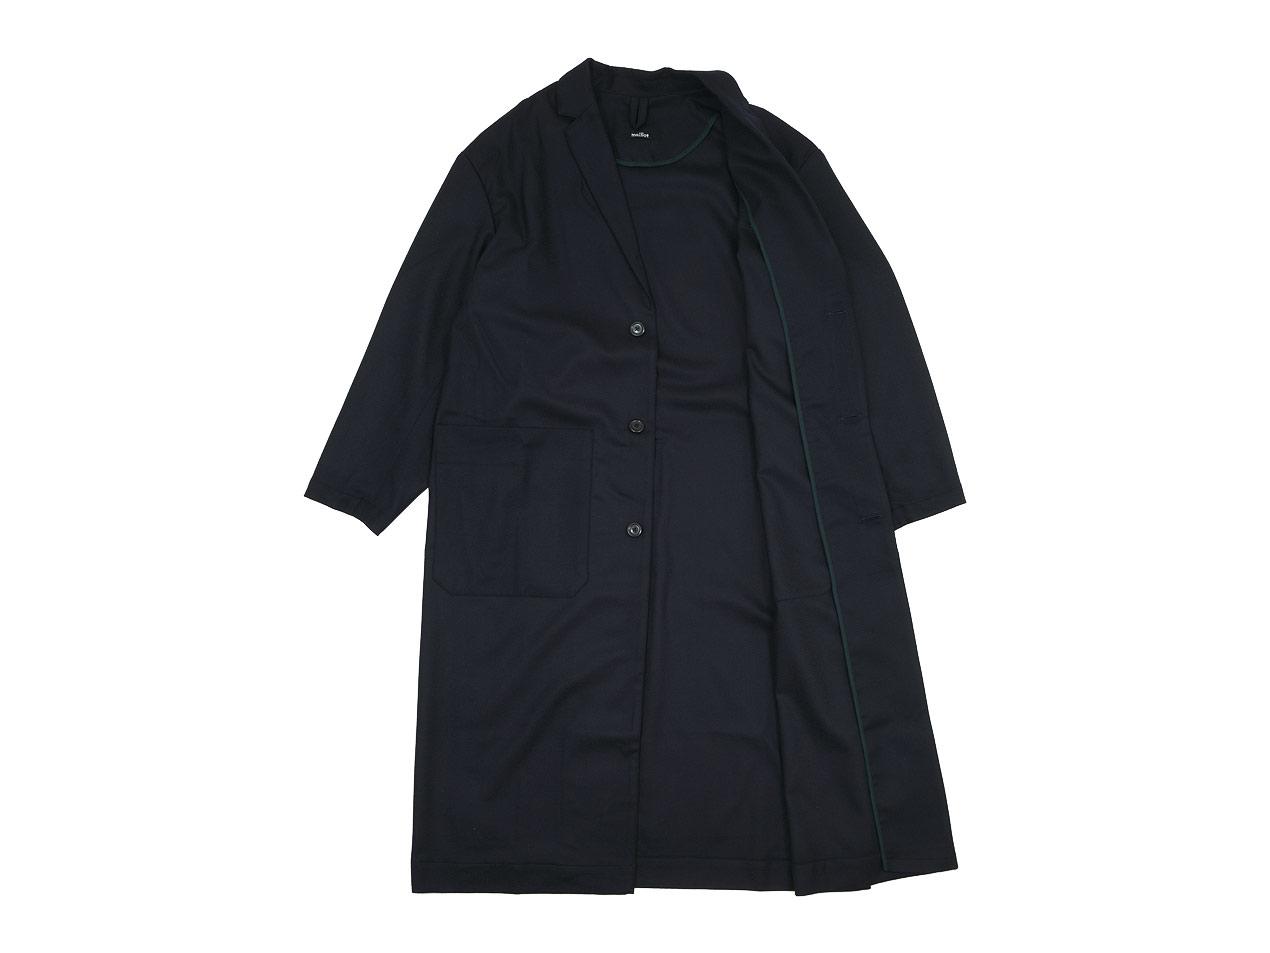 maillot mature wool labo coat